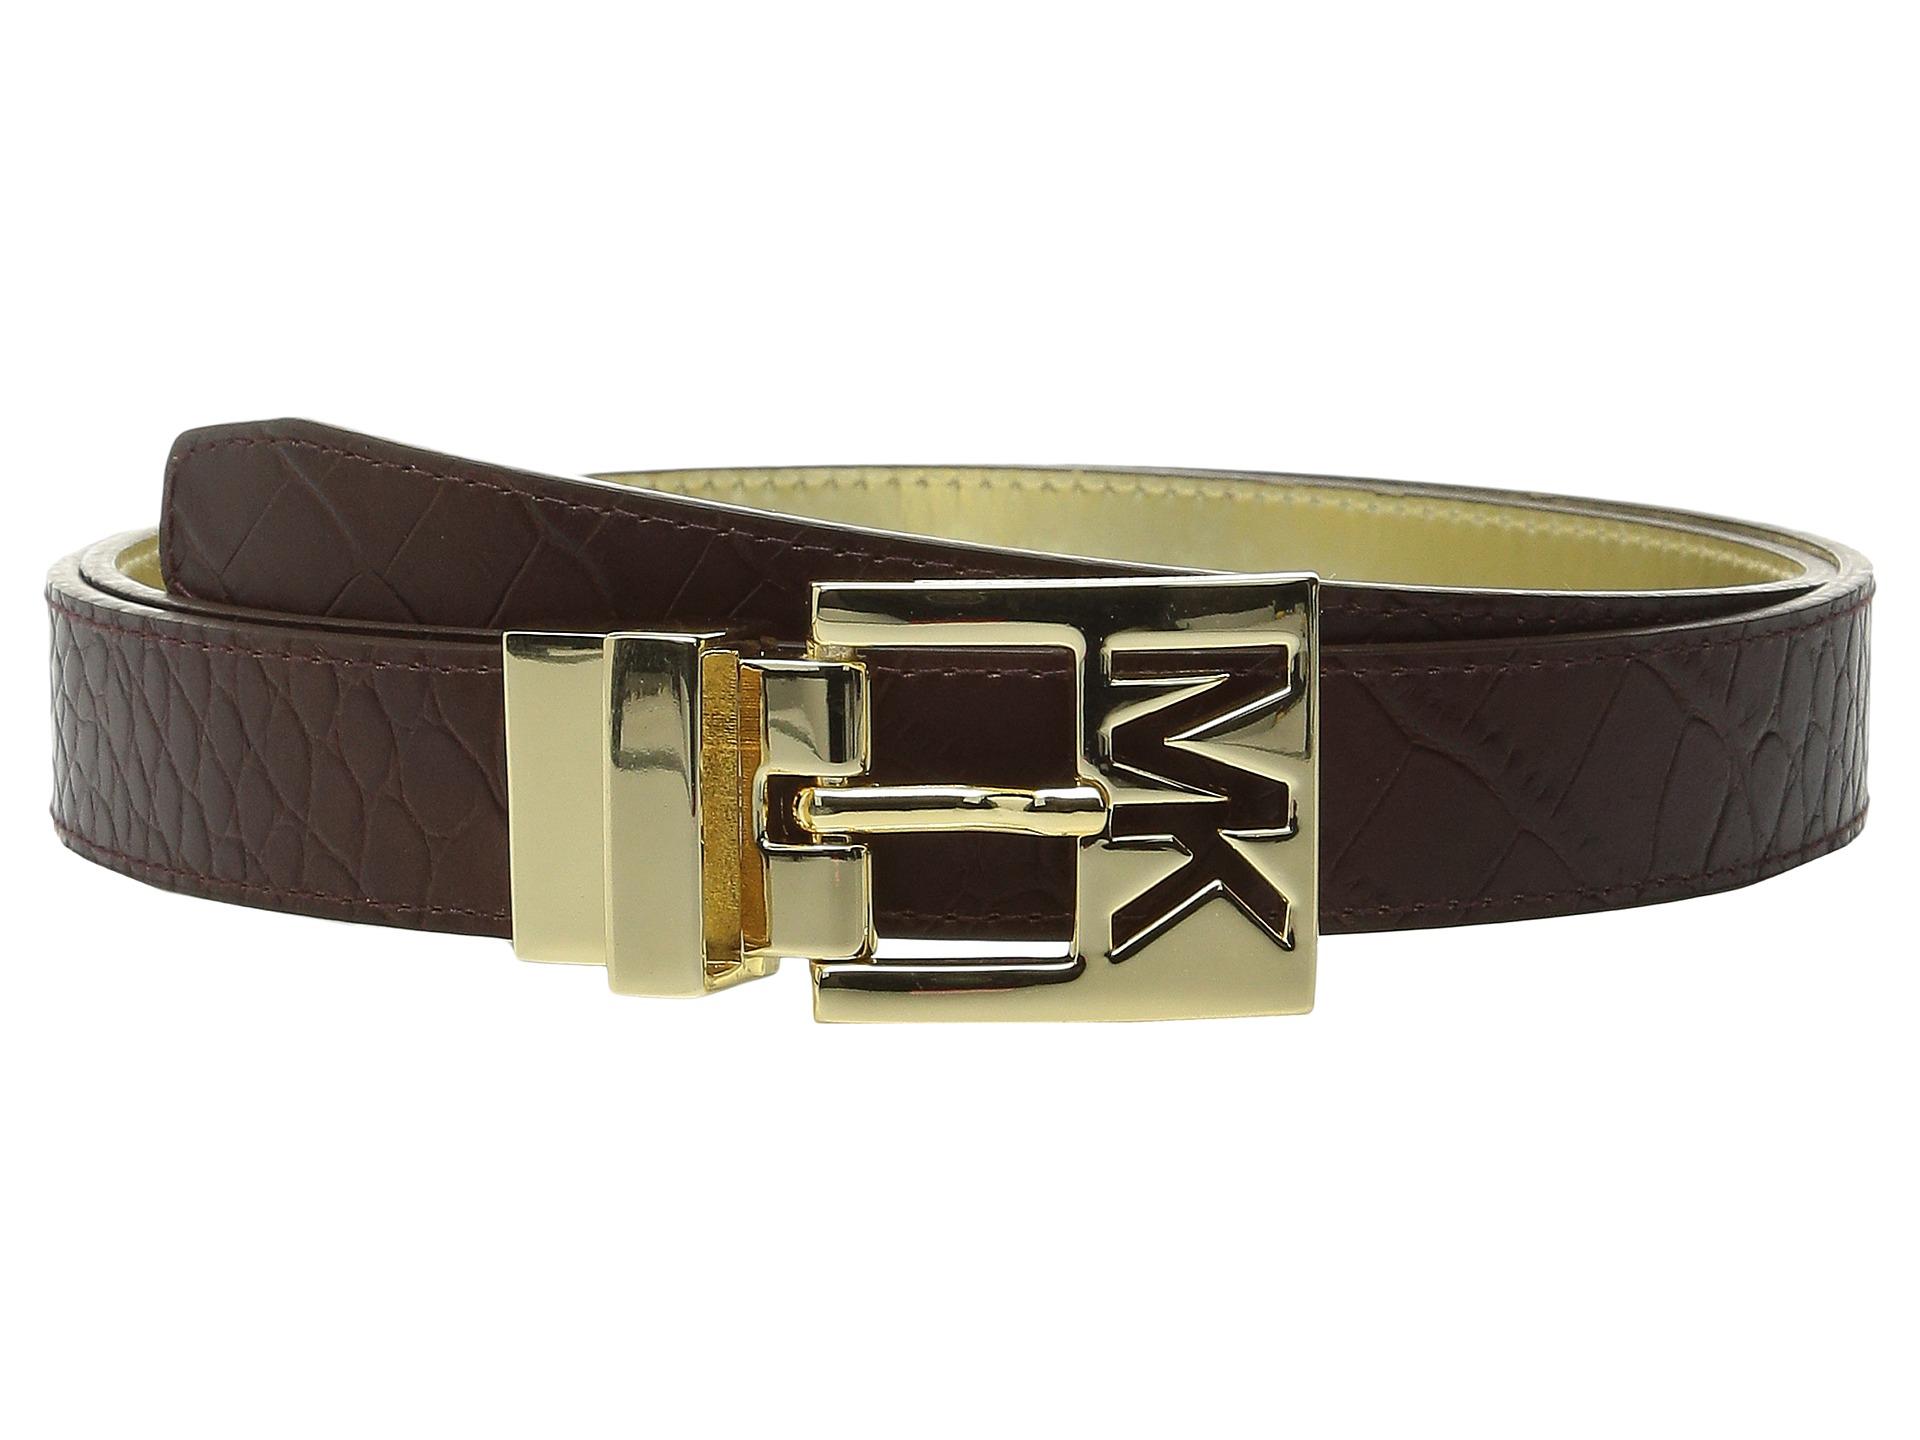 Michael Kors 25mm Reversible Belt With Mk Cutout